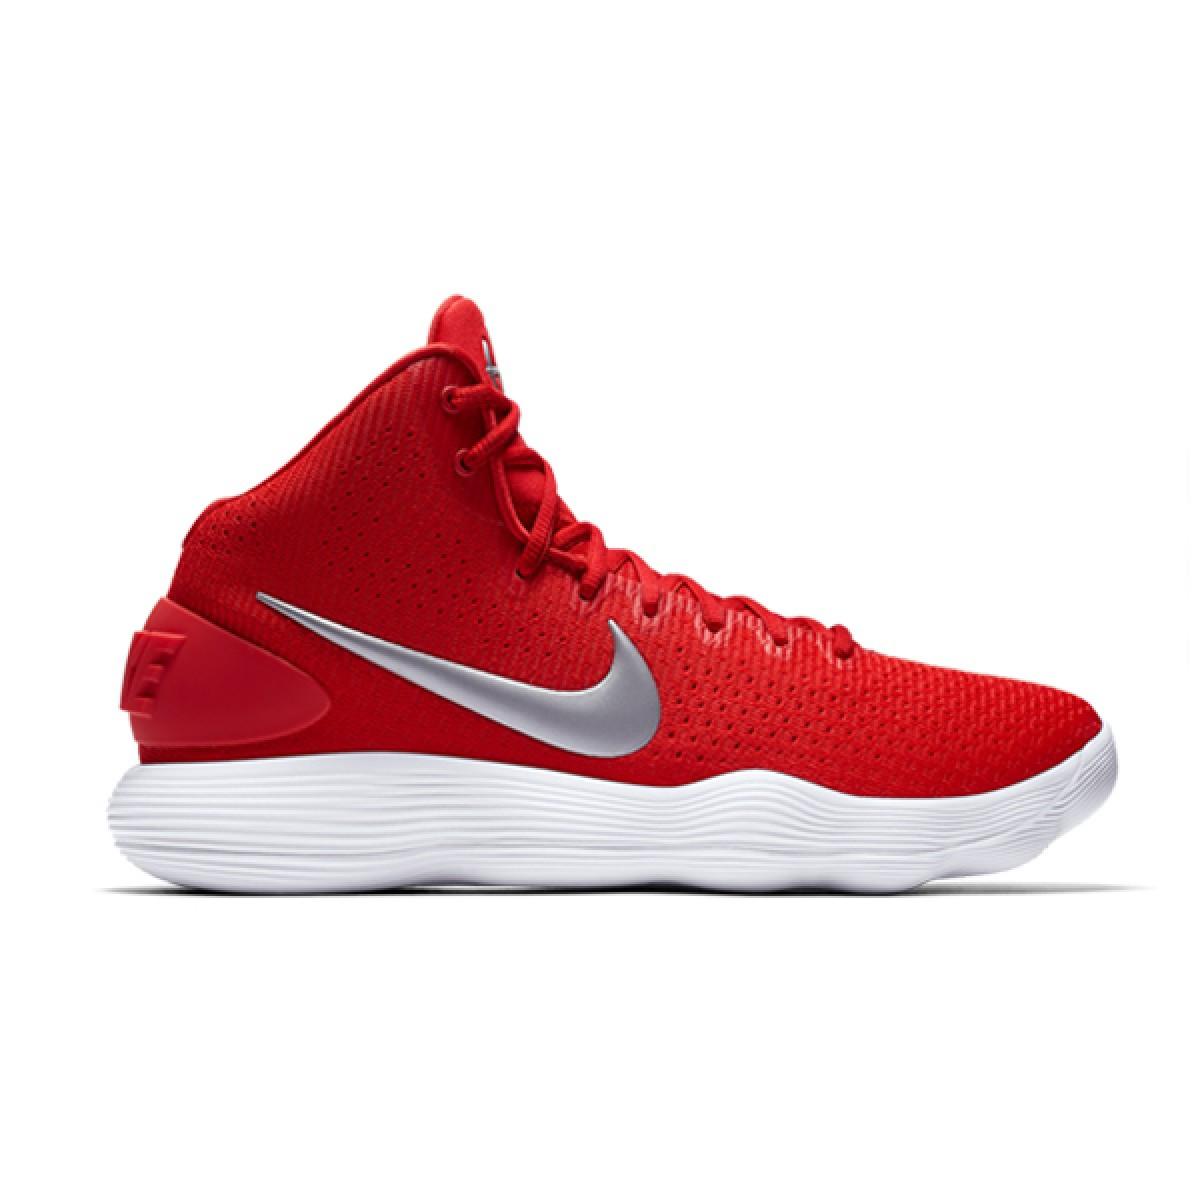 Nike Hyperdunk 2017  'Red'